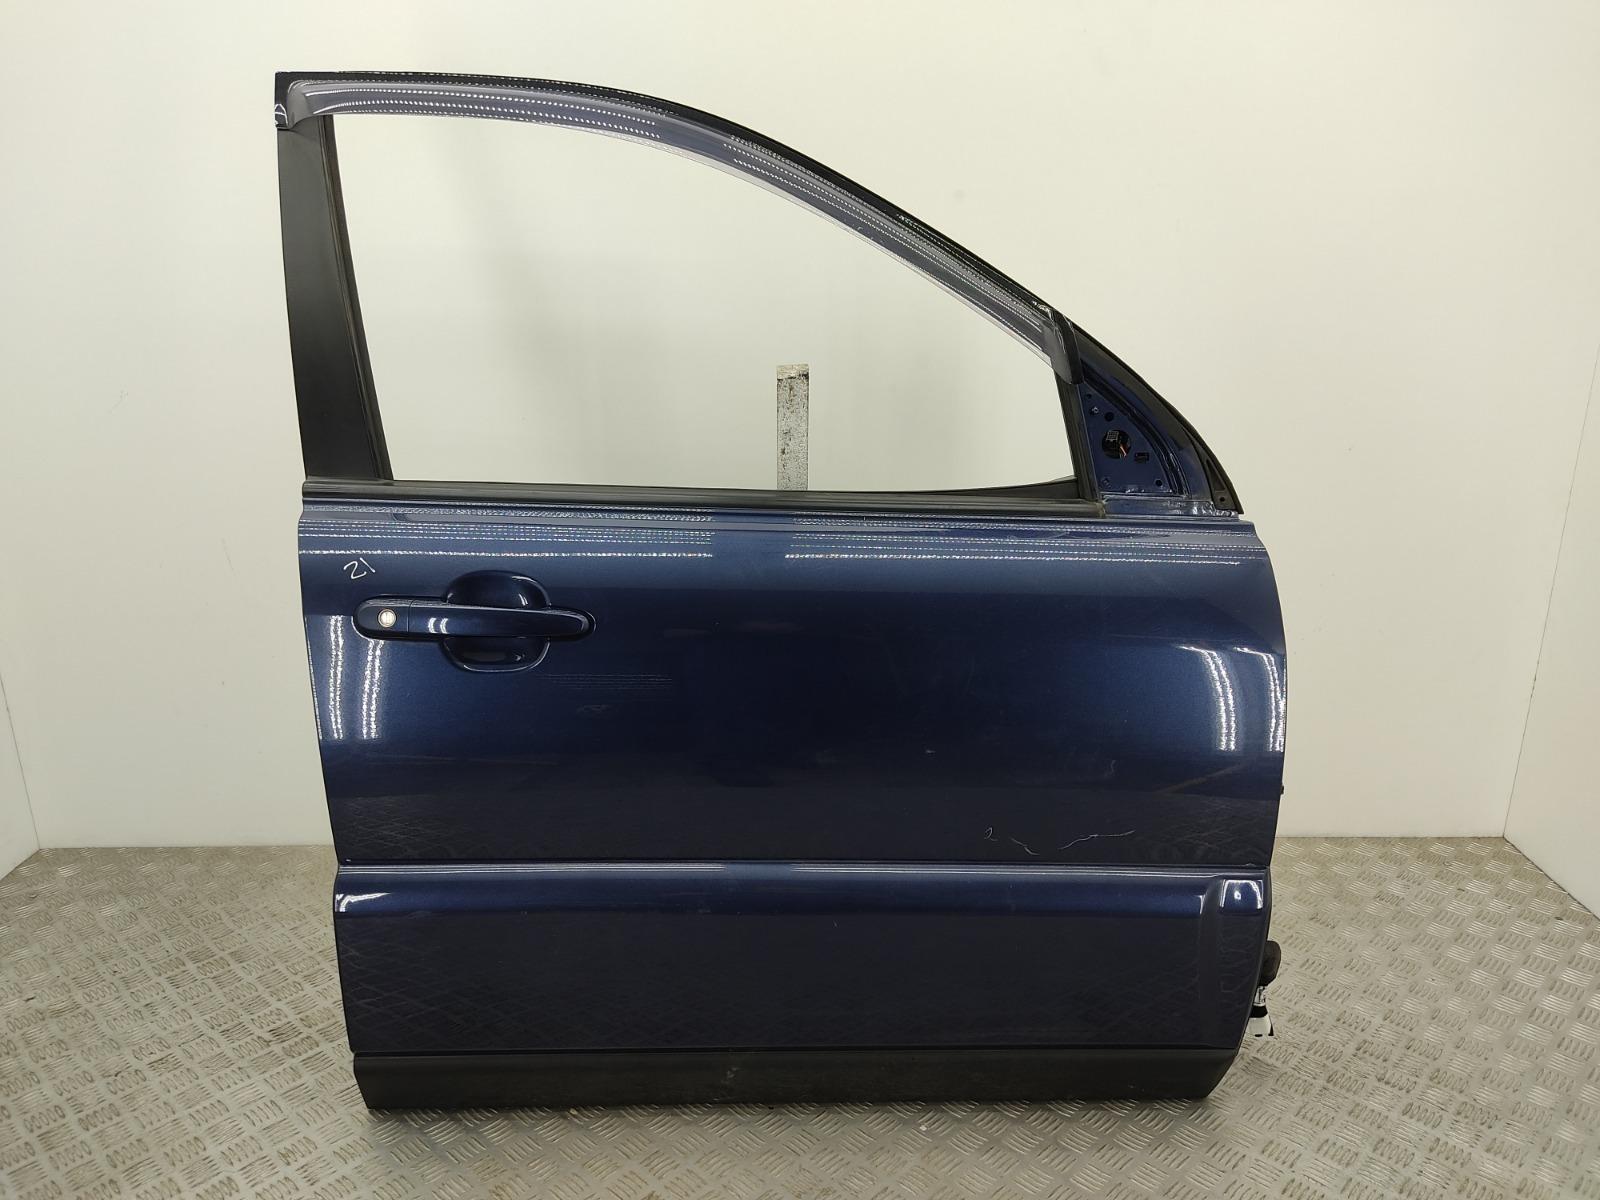 Дверь передняя правая Kia Sportage 2.0 CRDI 2009 (б/у)